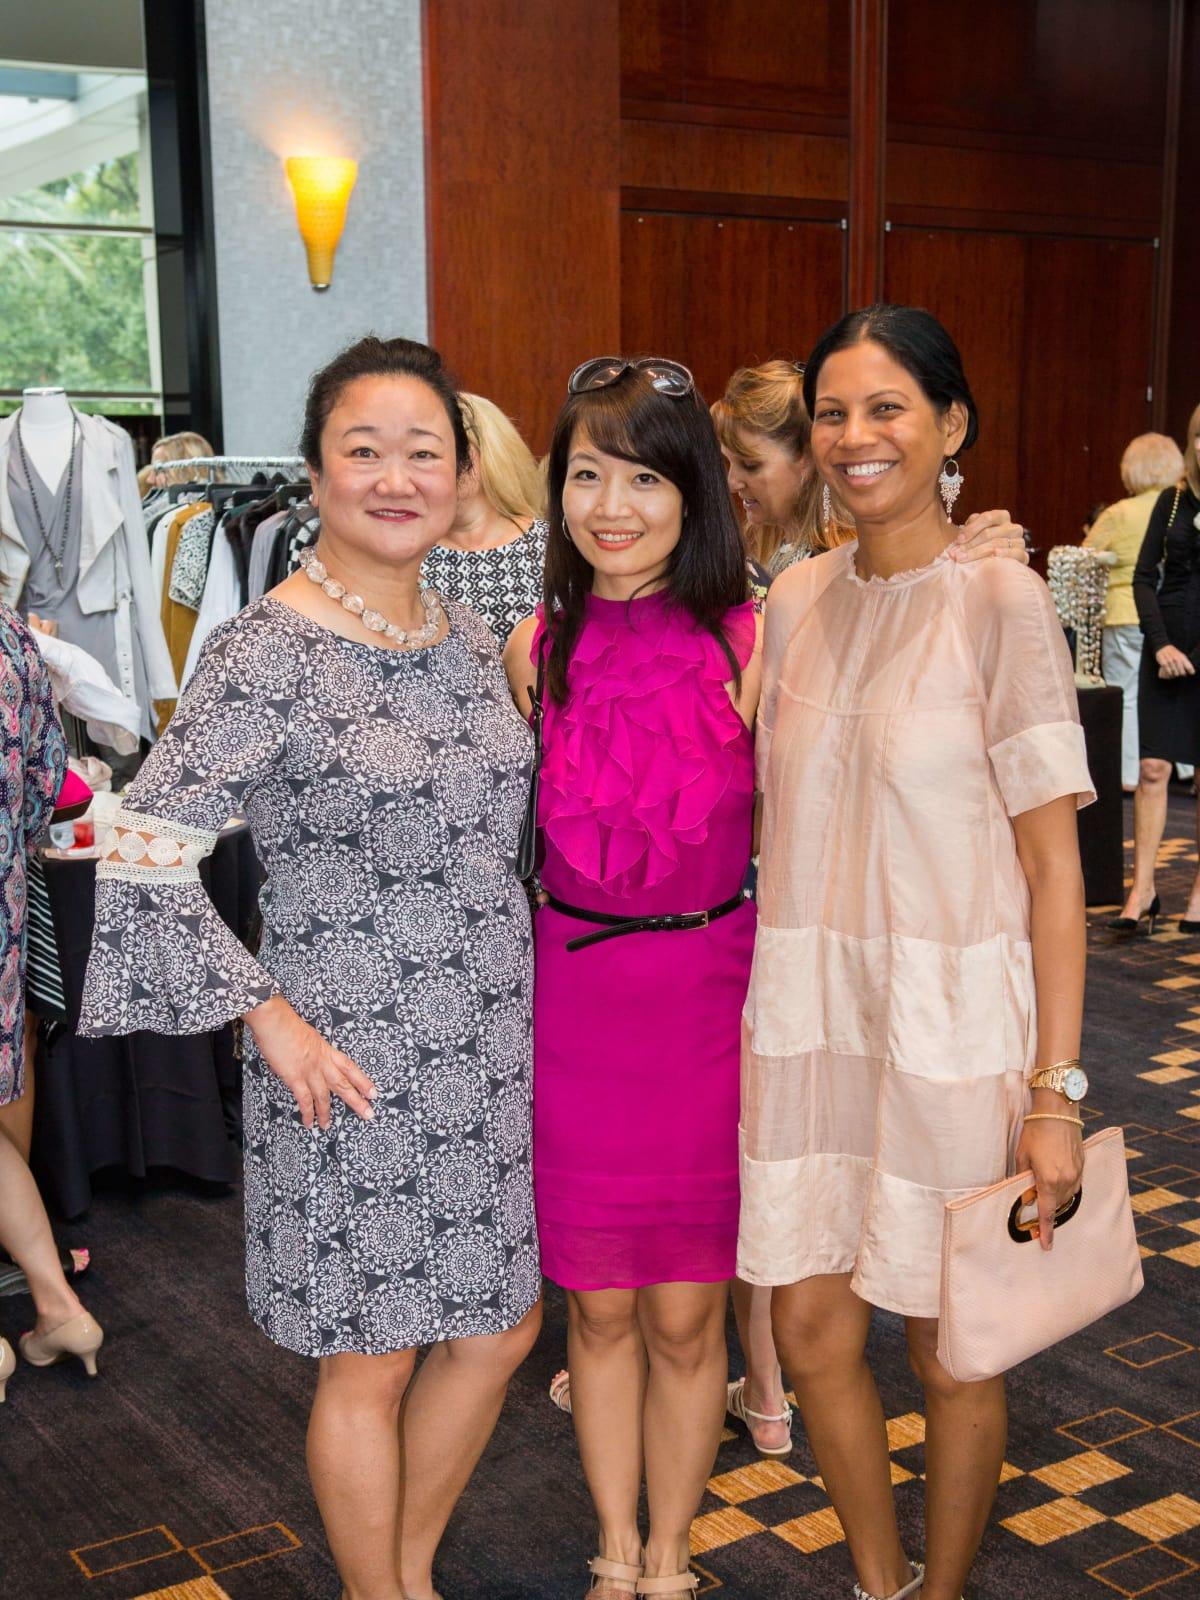 Women's Hospital Labor Day lunch, 8/16,  Wendy Chung, Anne Chou, Avril Nunes